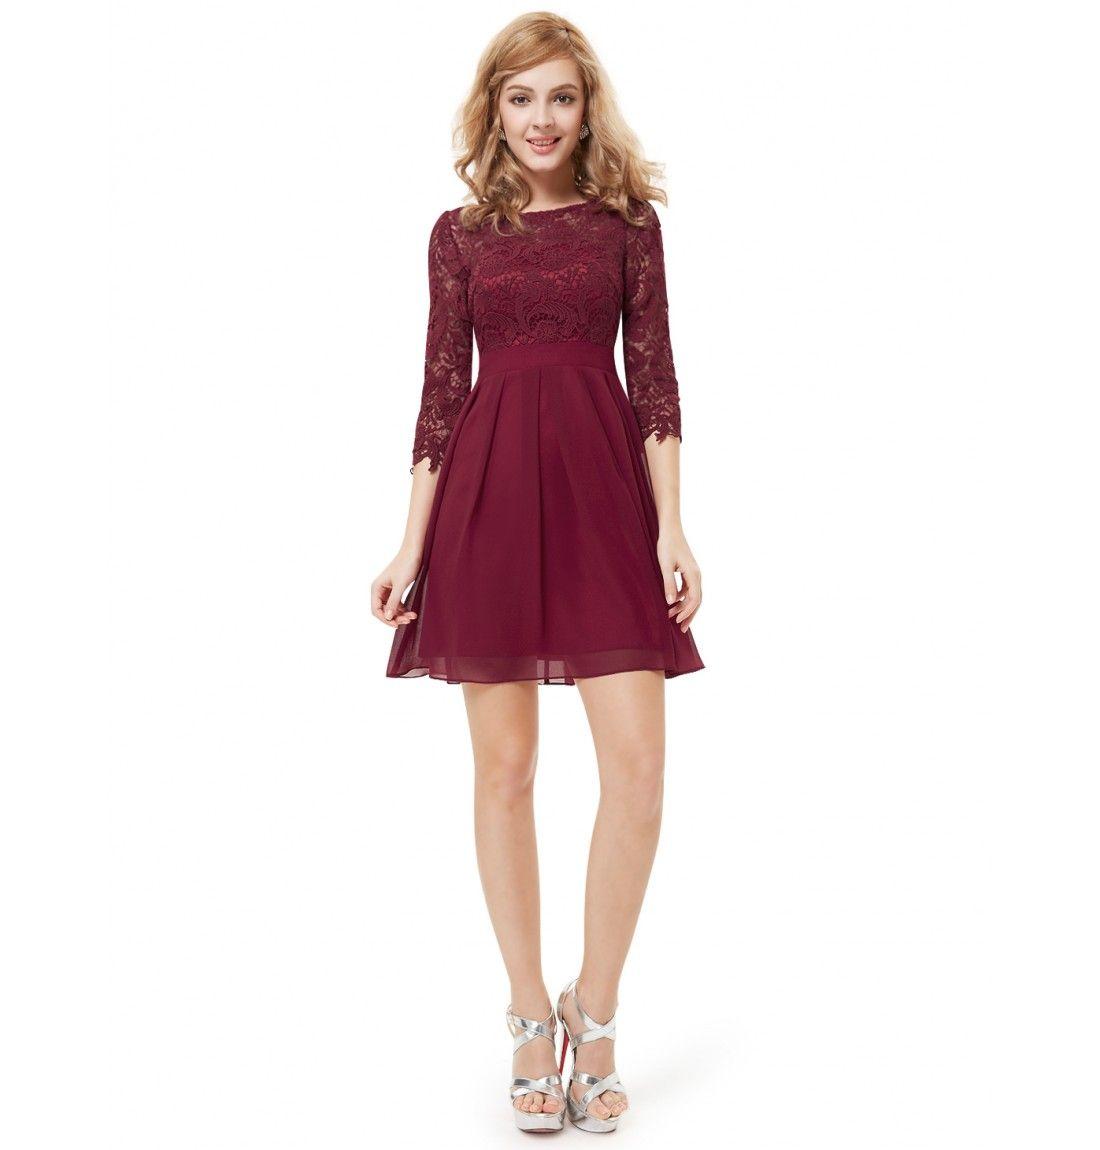 Damen 3/4 Arm Cocktailkleid Dunkel Rot | Klamotten | Pinterest ...